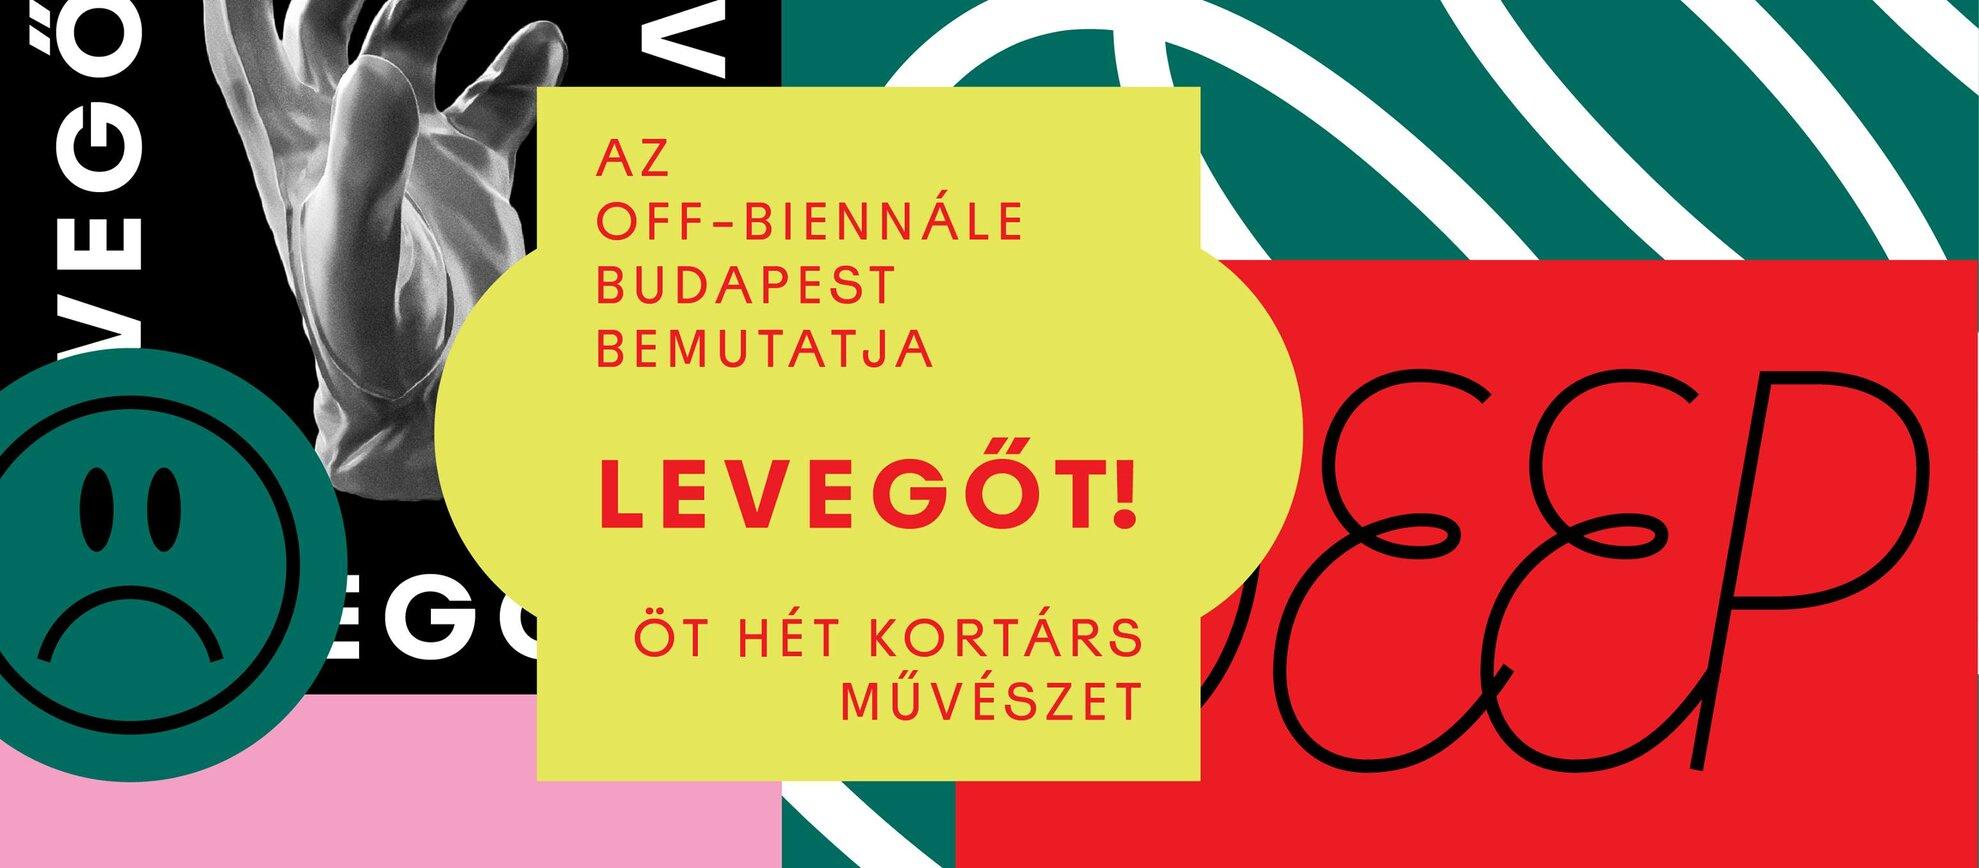 OFF-Biennále 2020 - Levegőt!